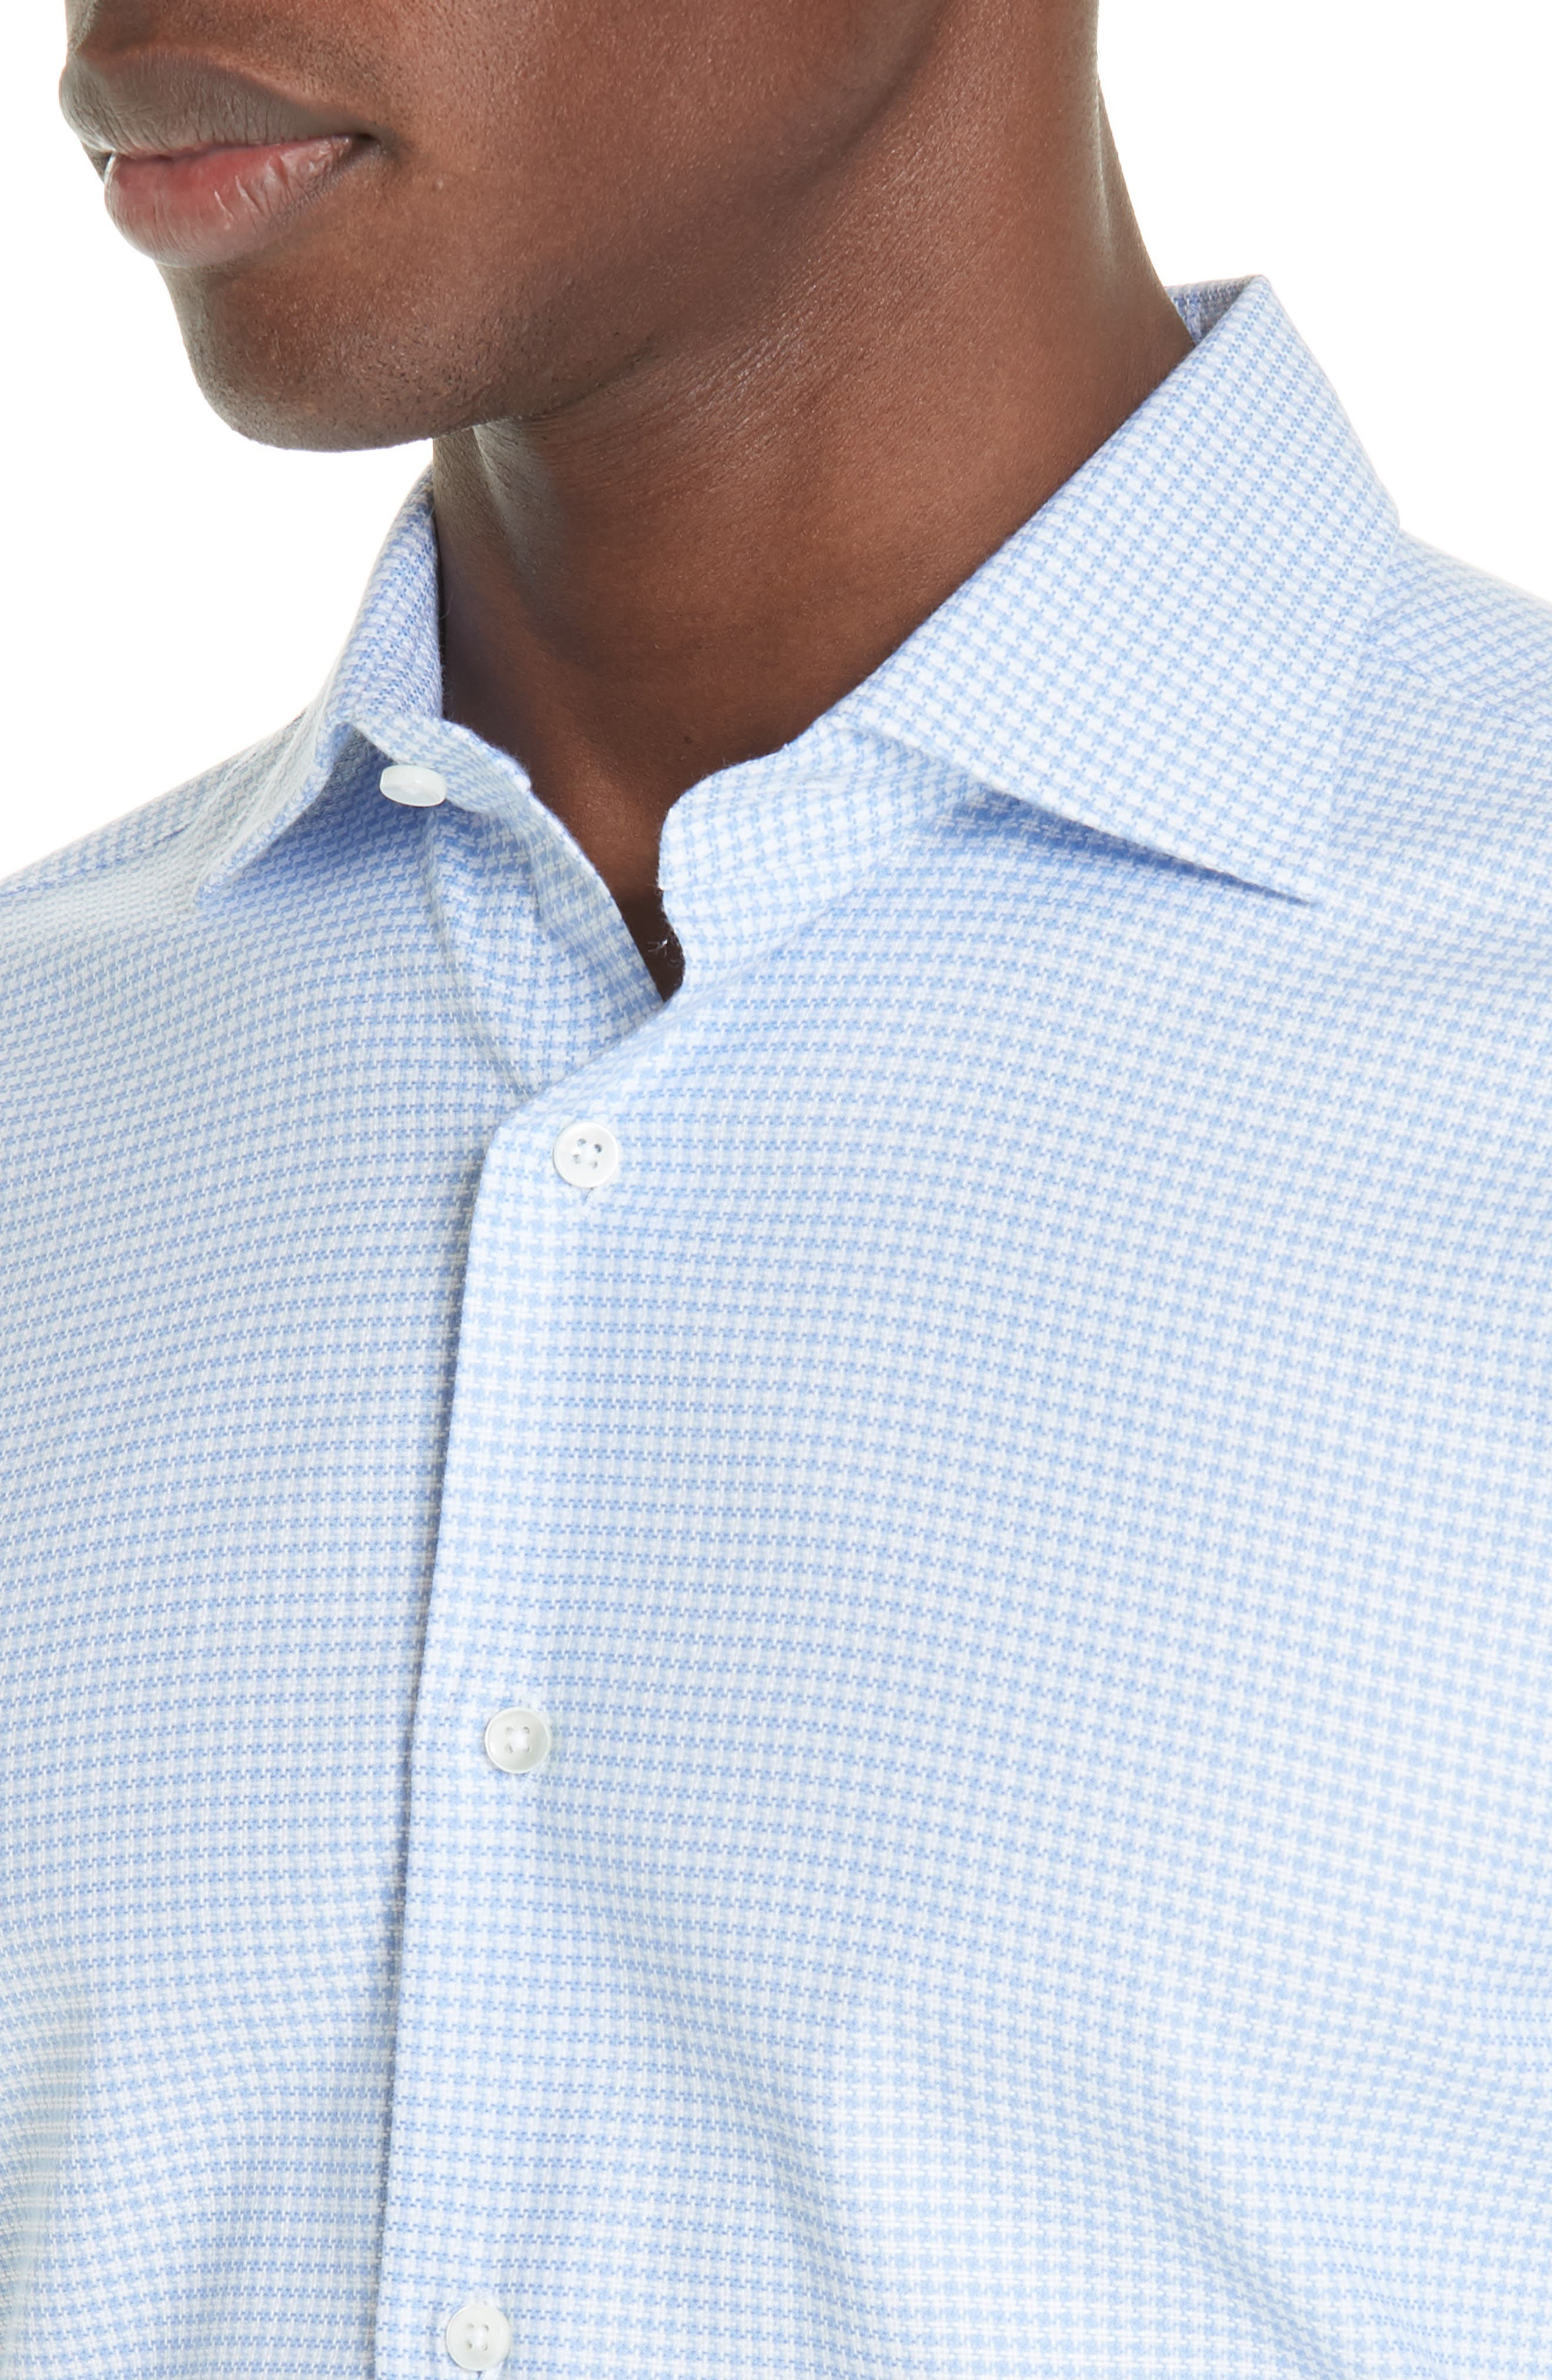 Trim Fit Houndstooth Dress Shirt,                             Alternate thumbnail 2, color,                             LIGHT BLUE